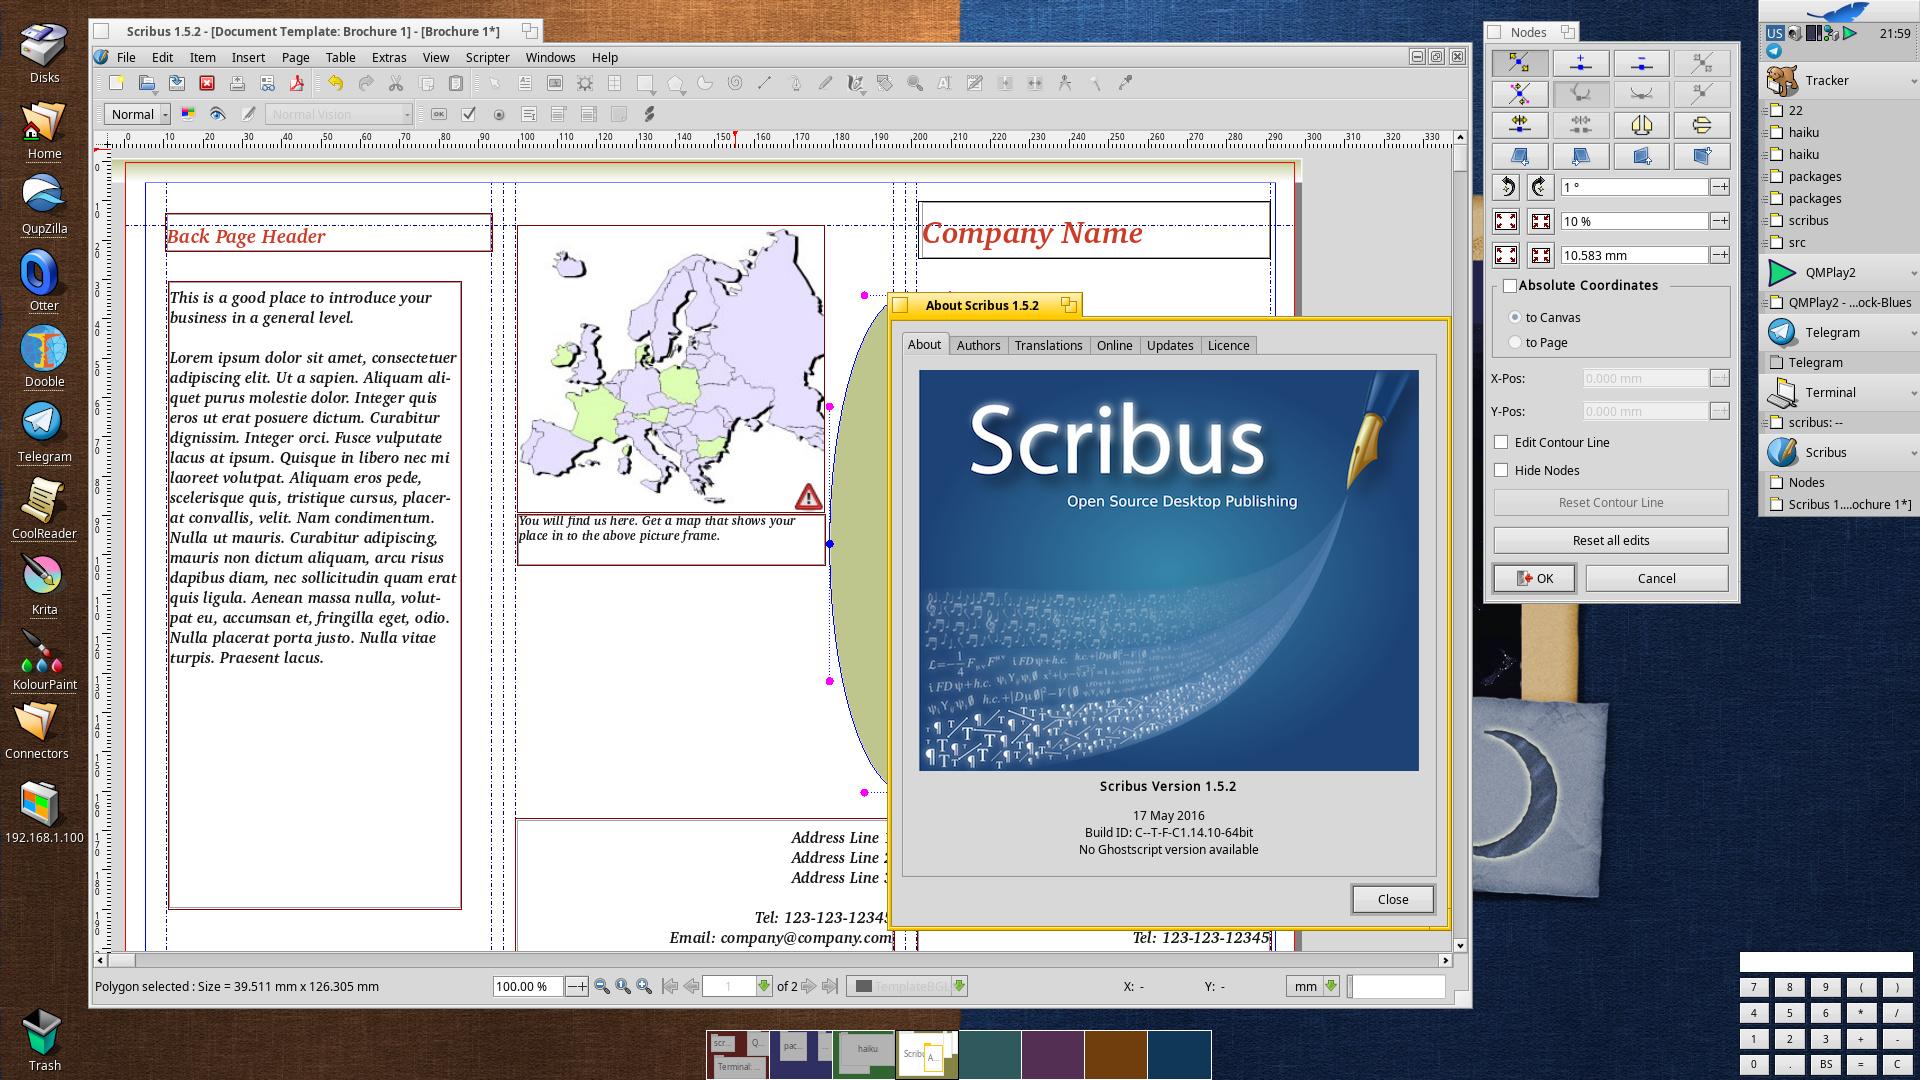 Scribus Portable 147 desktop publishing Released